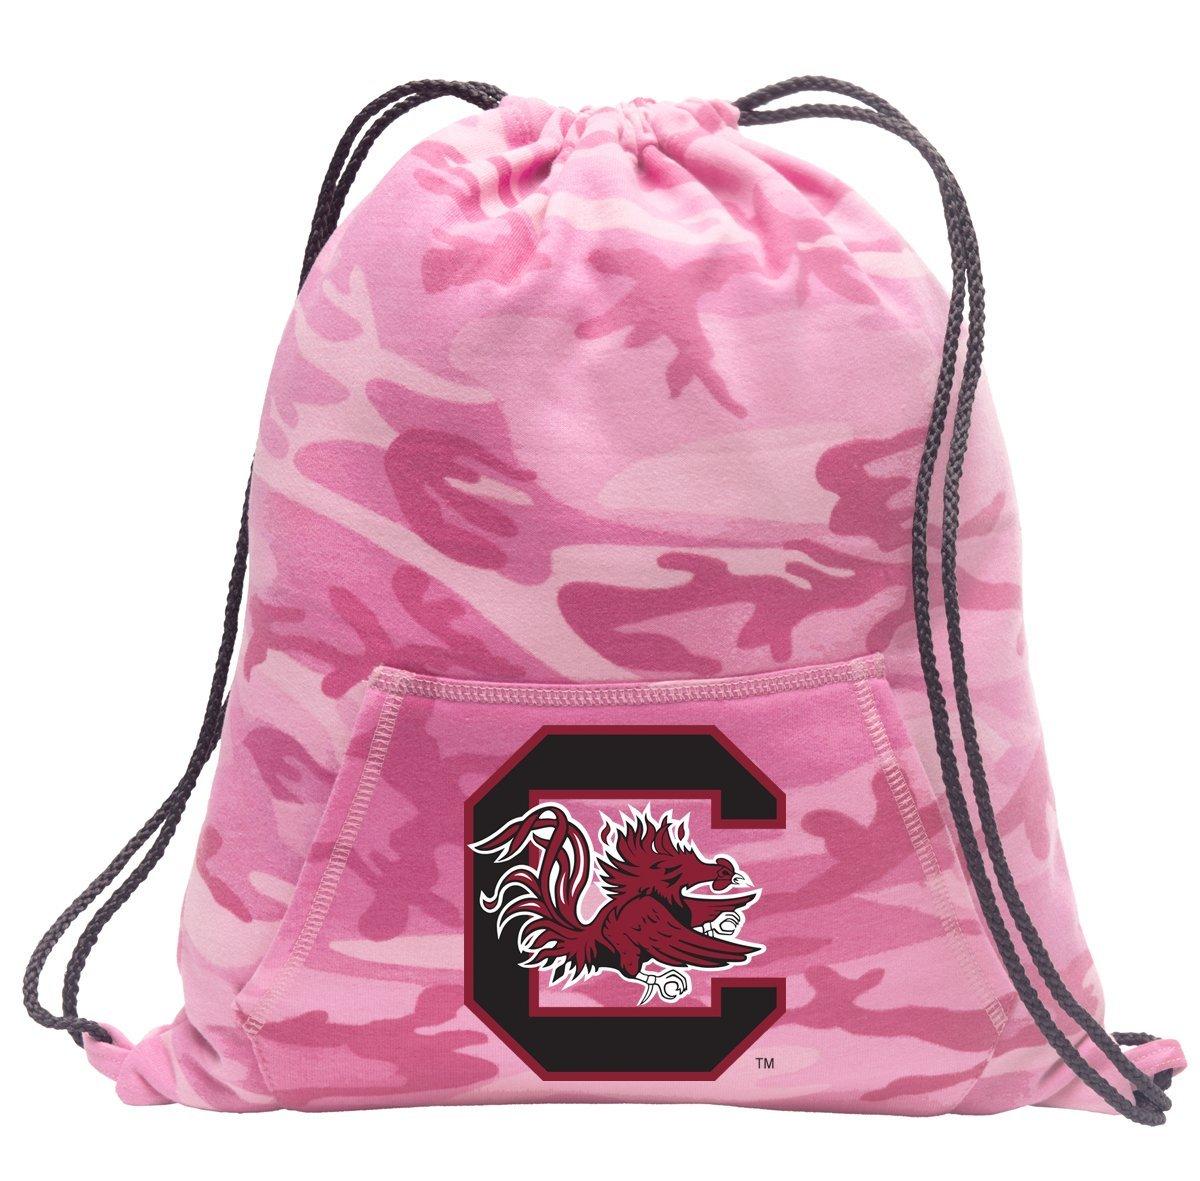 Cute Camo University of South Carolina Drawstring Bag Hoody South Carolina Gamecocks Cinch Pack for Girls & Women